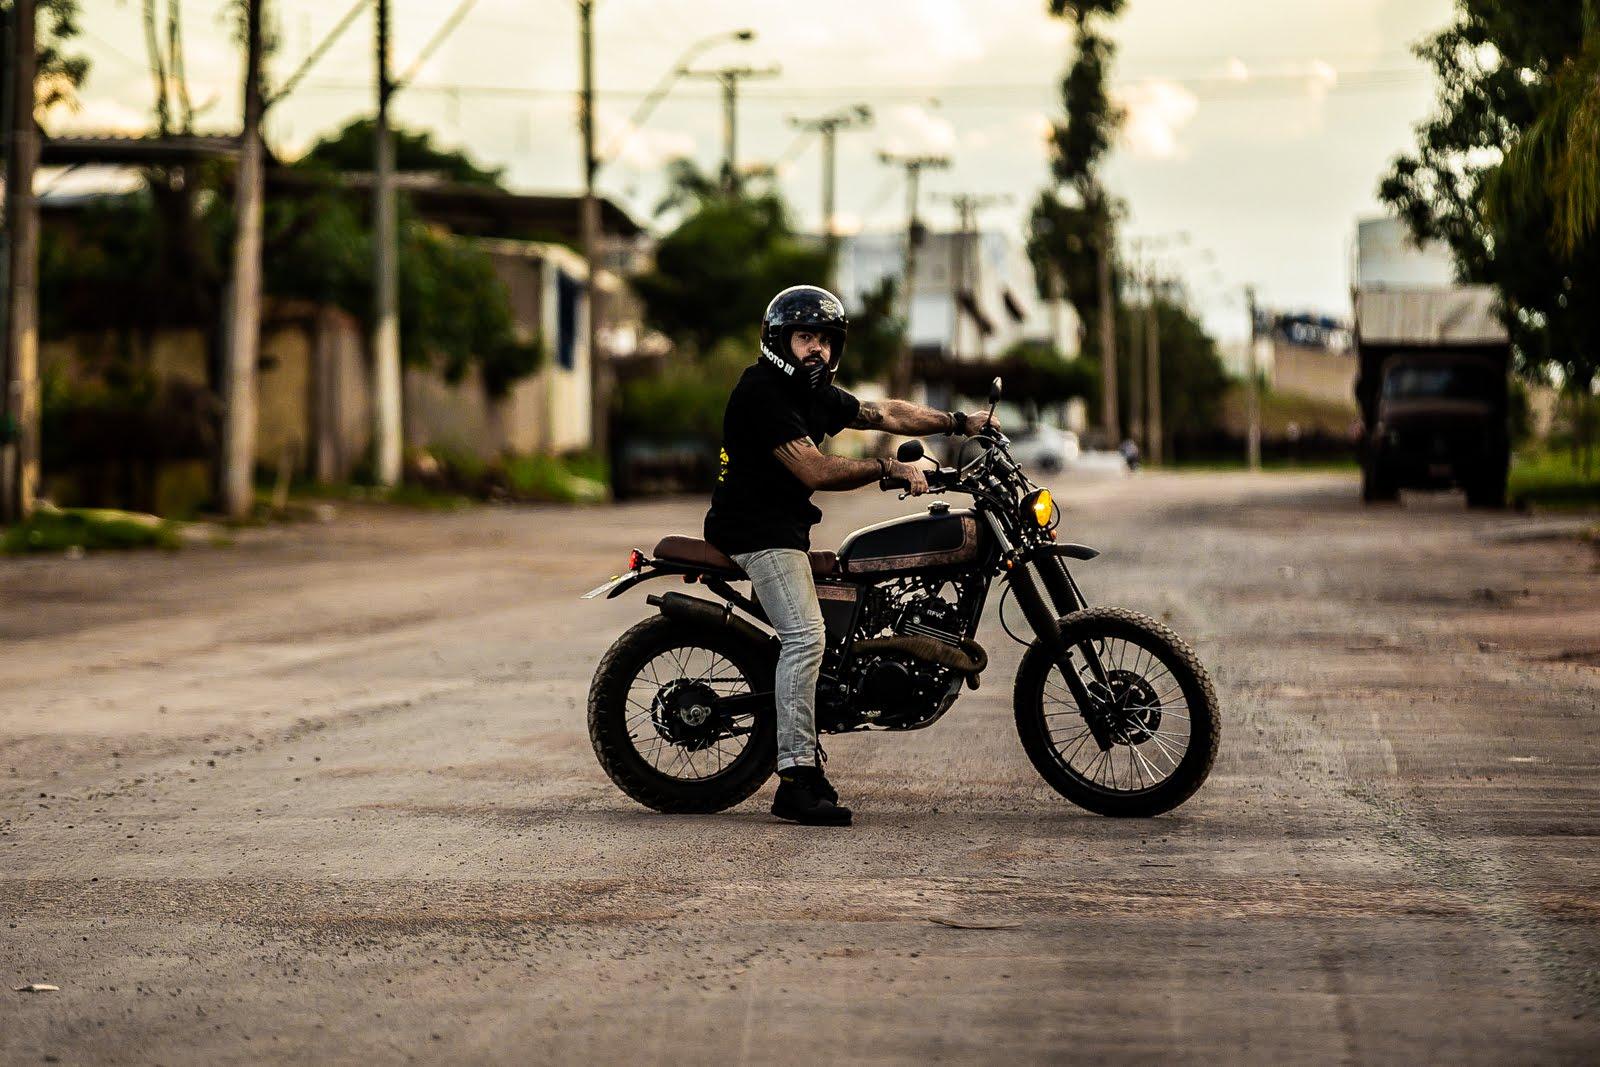 Honda Sahara - © bruno pinheiro